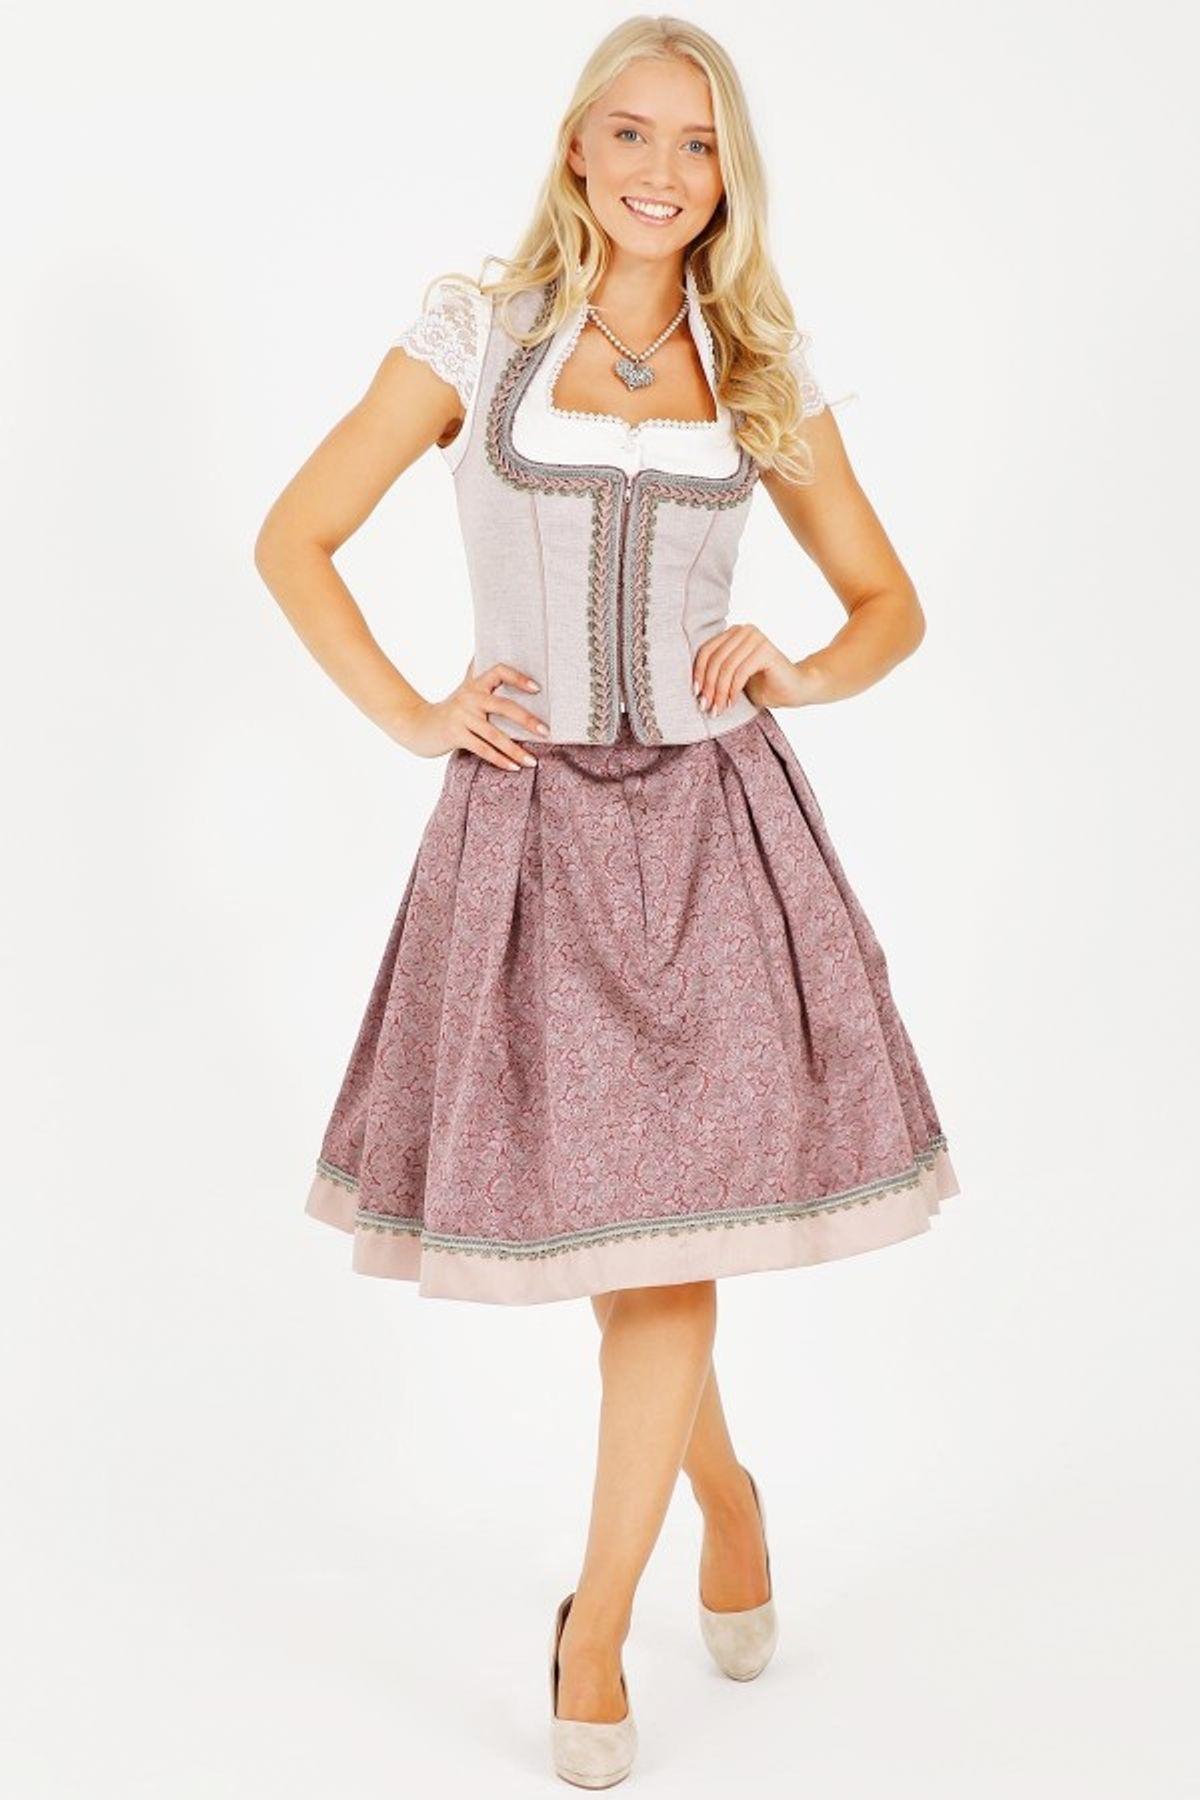 Krüger - Damen Trachtenrock in rosa,  Mary (25670-33) – Bild 3